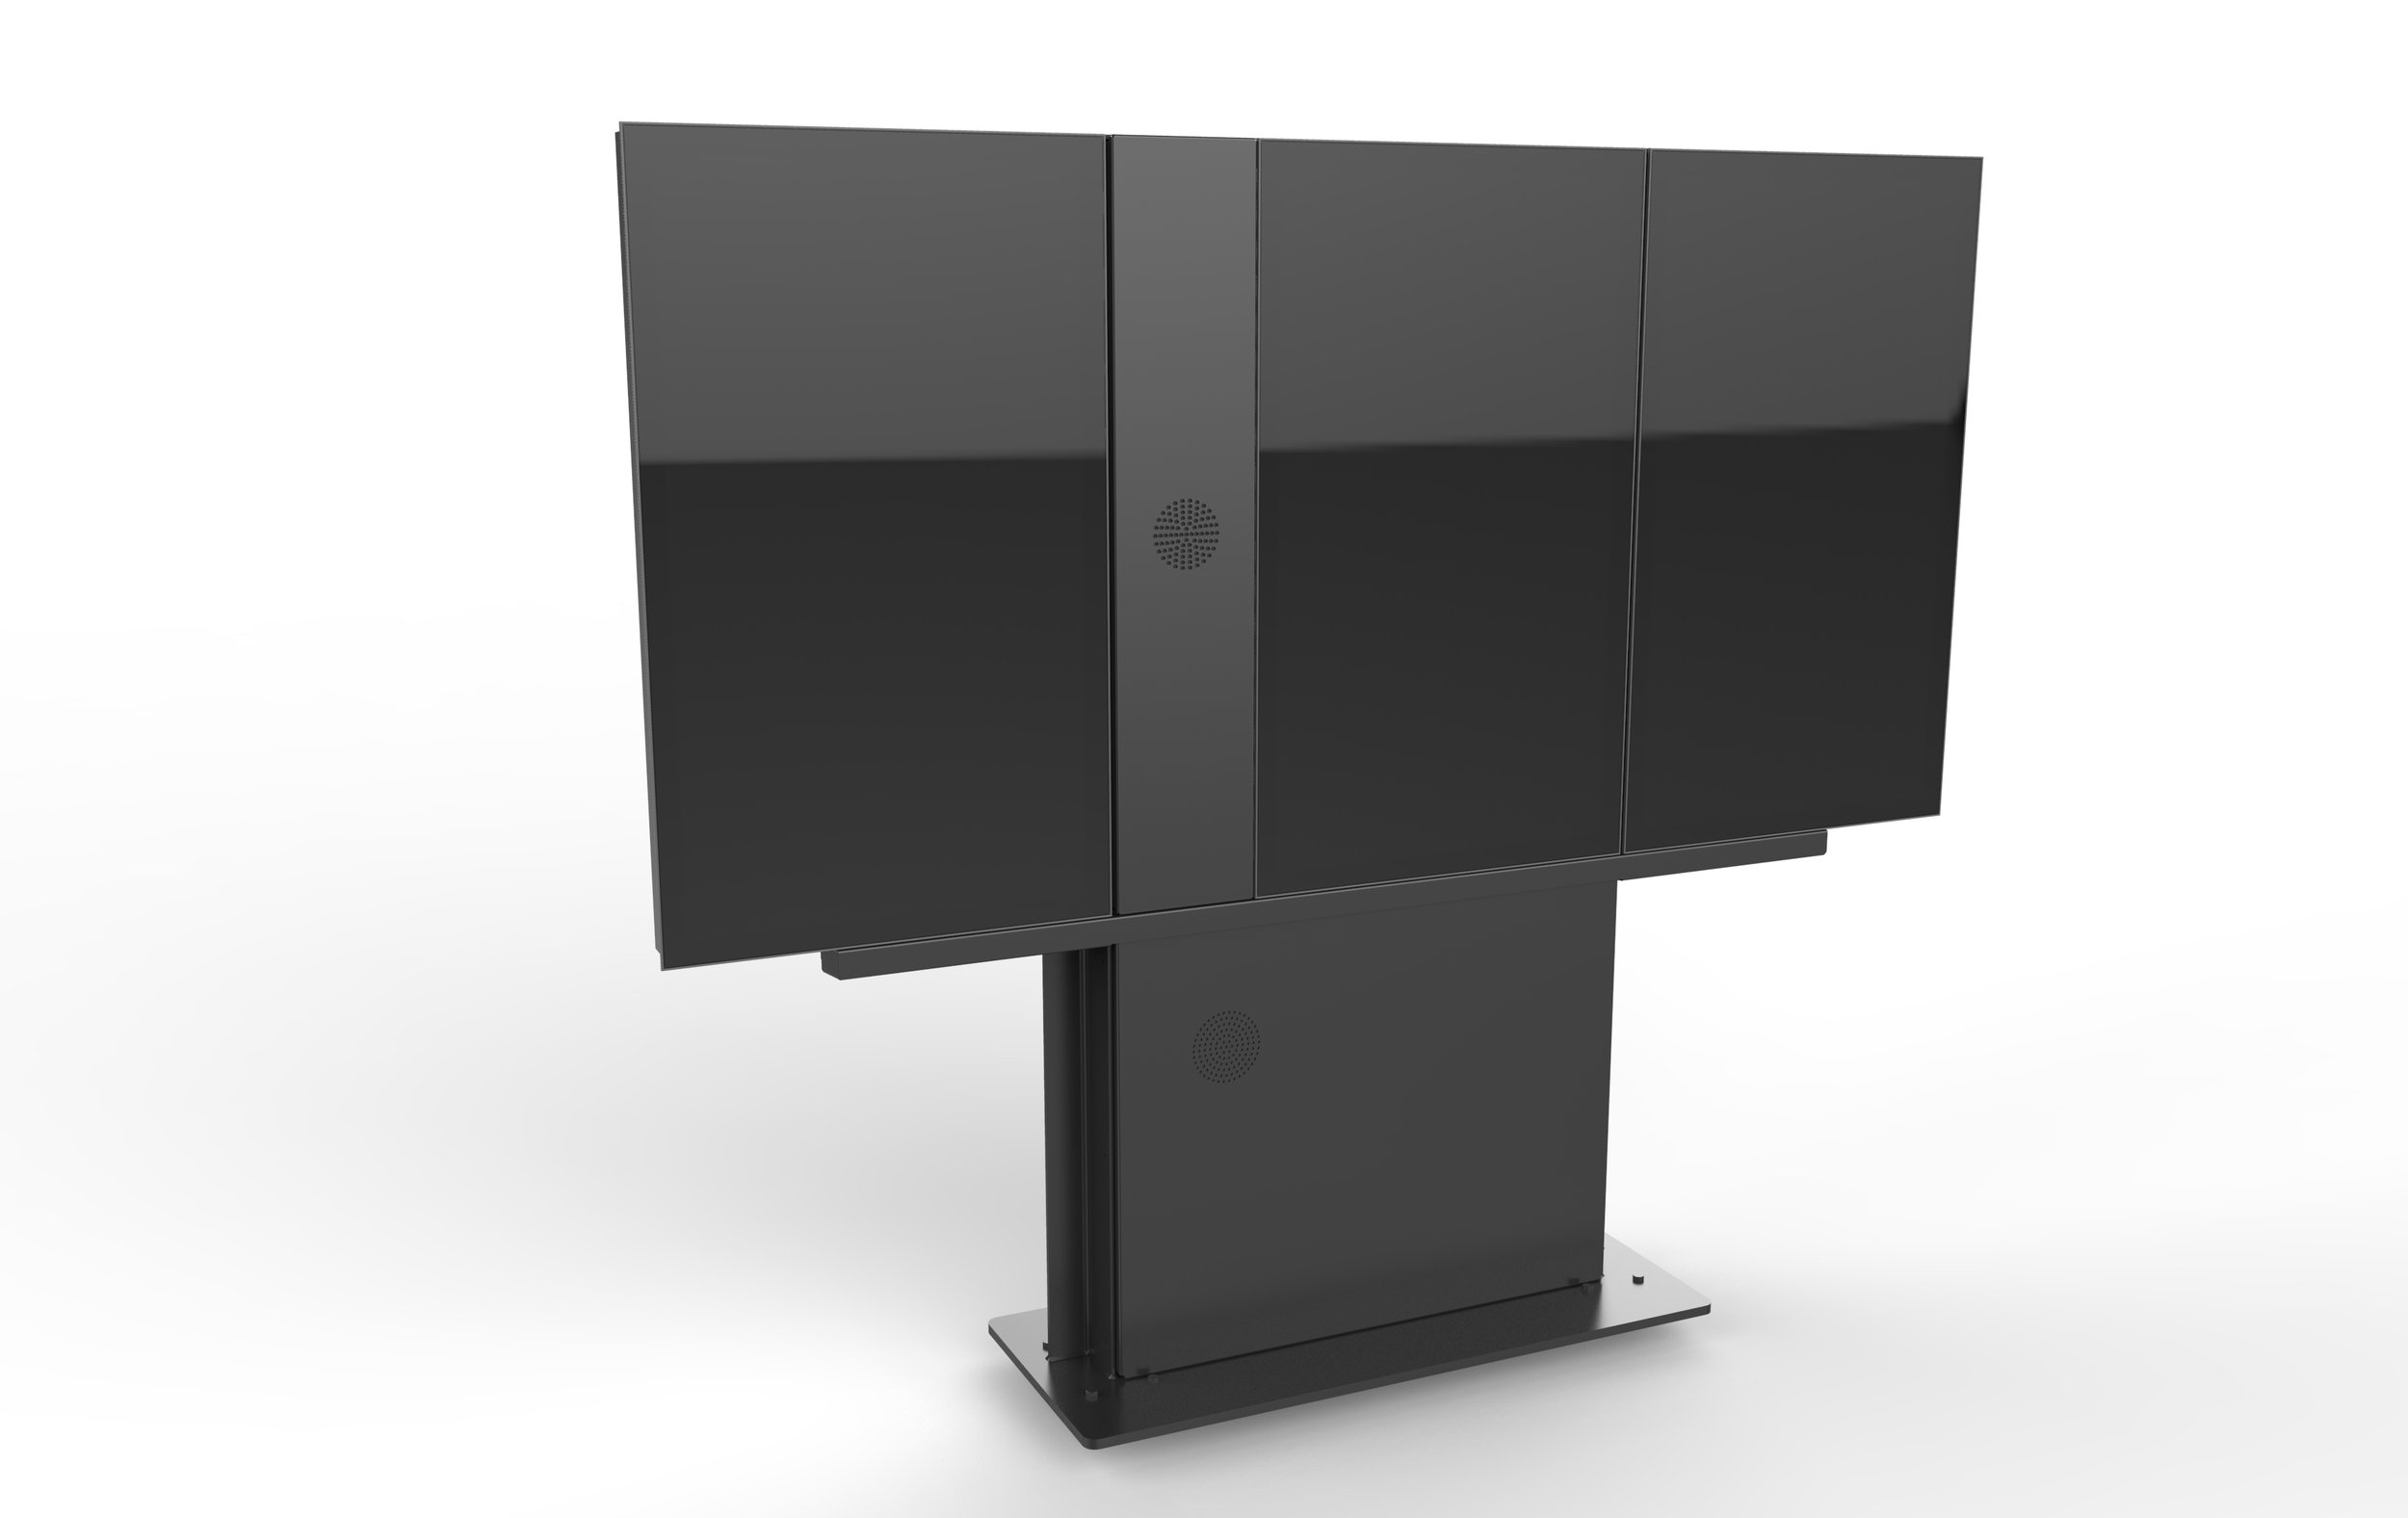 Globex-engineering-product-design-consultancy